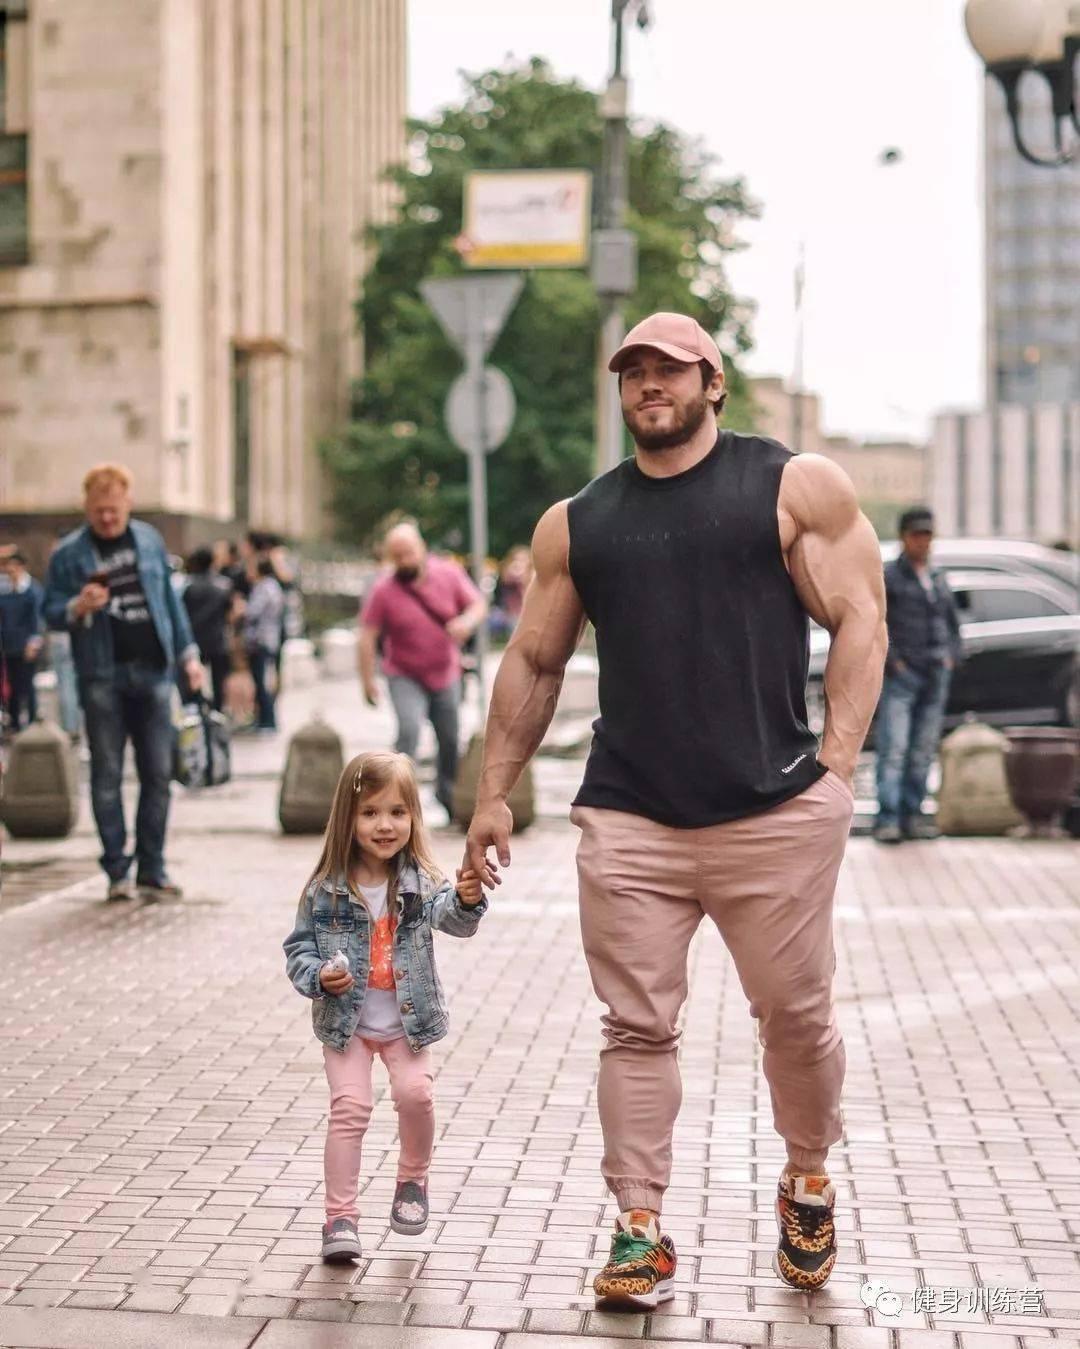 55cm臂围的肌肉硬汉,看了他的奶爸日常,我都想生娃了 初级健身 第28张